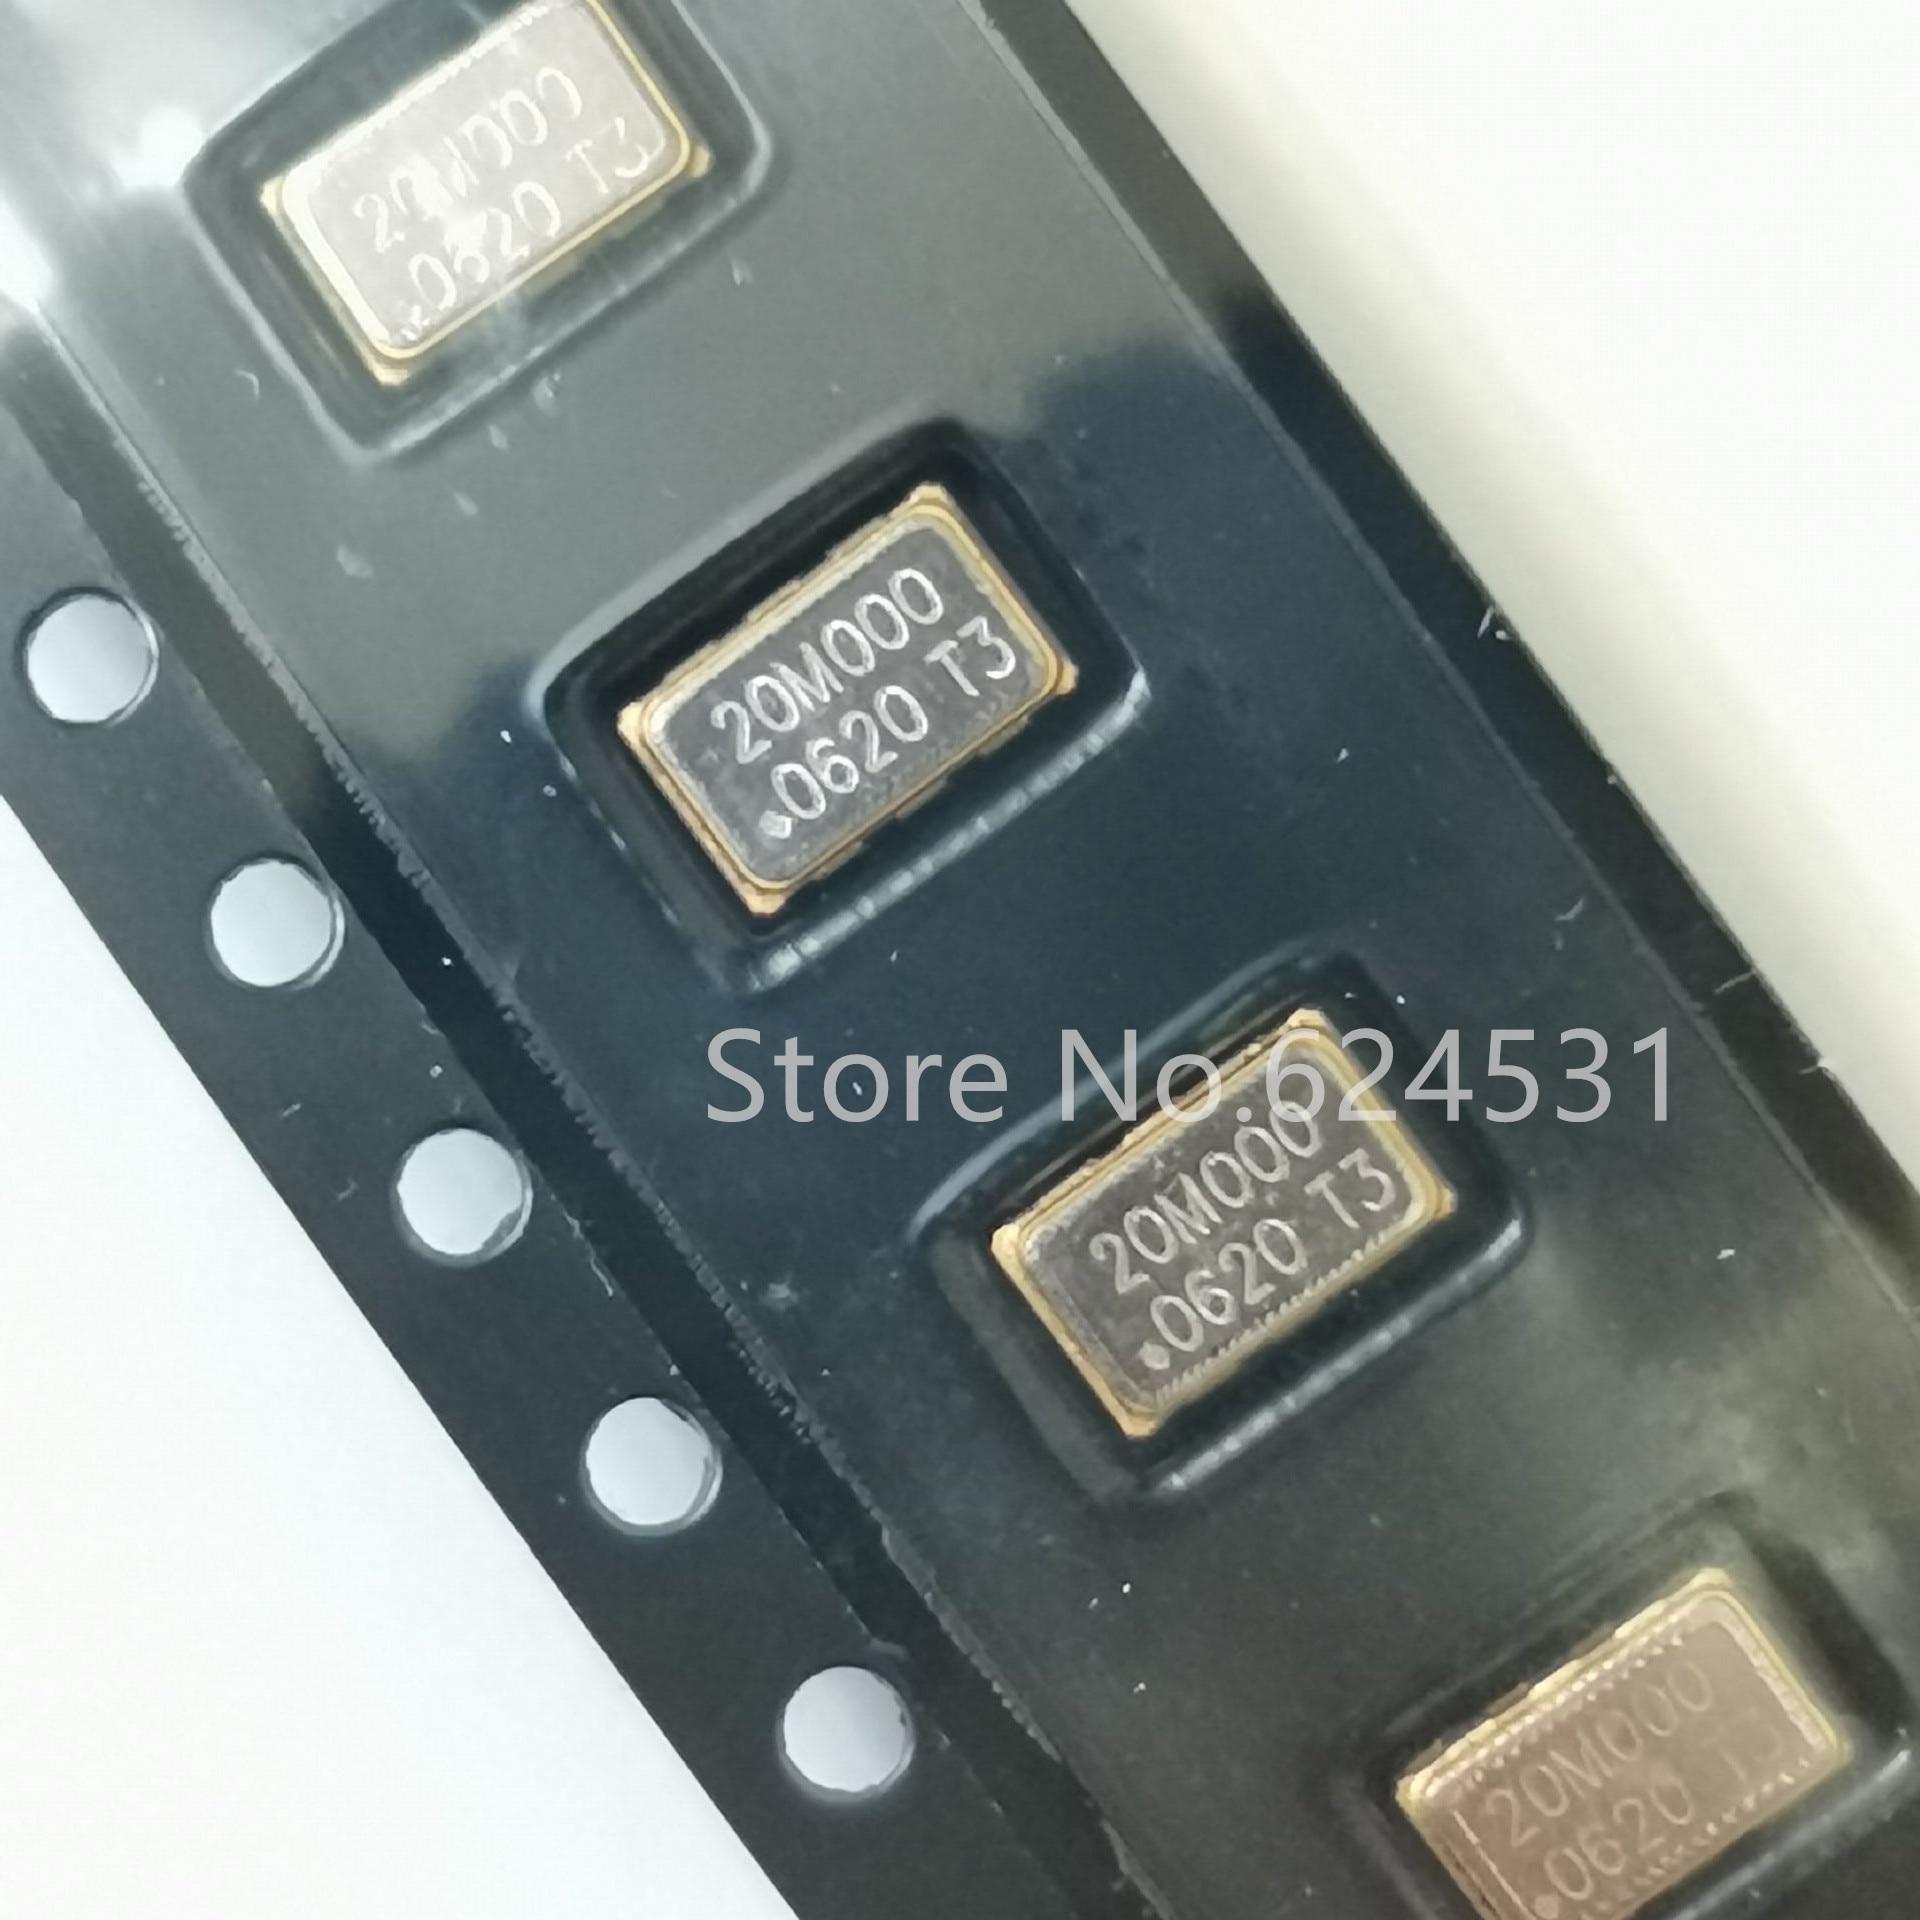 5pcs Patch Active Temperature Compensation Crystal 5032 5*3.2 TCXO 20MHZ 20.000MHZ 20M Resonator